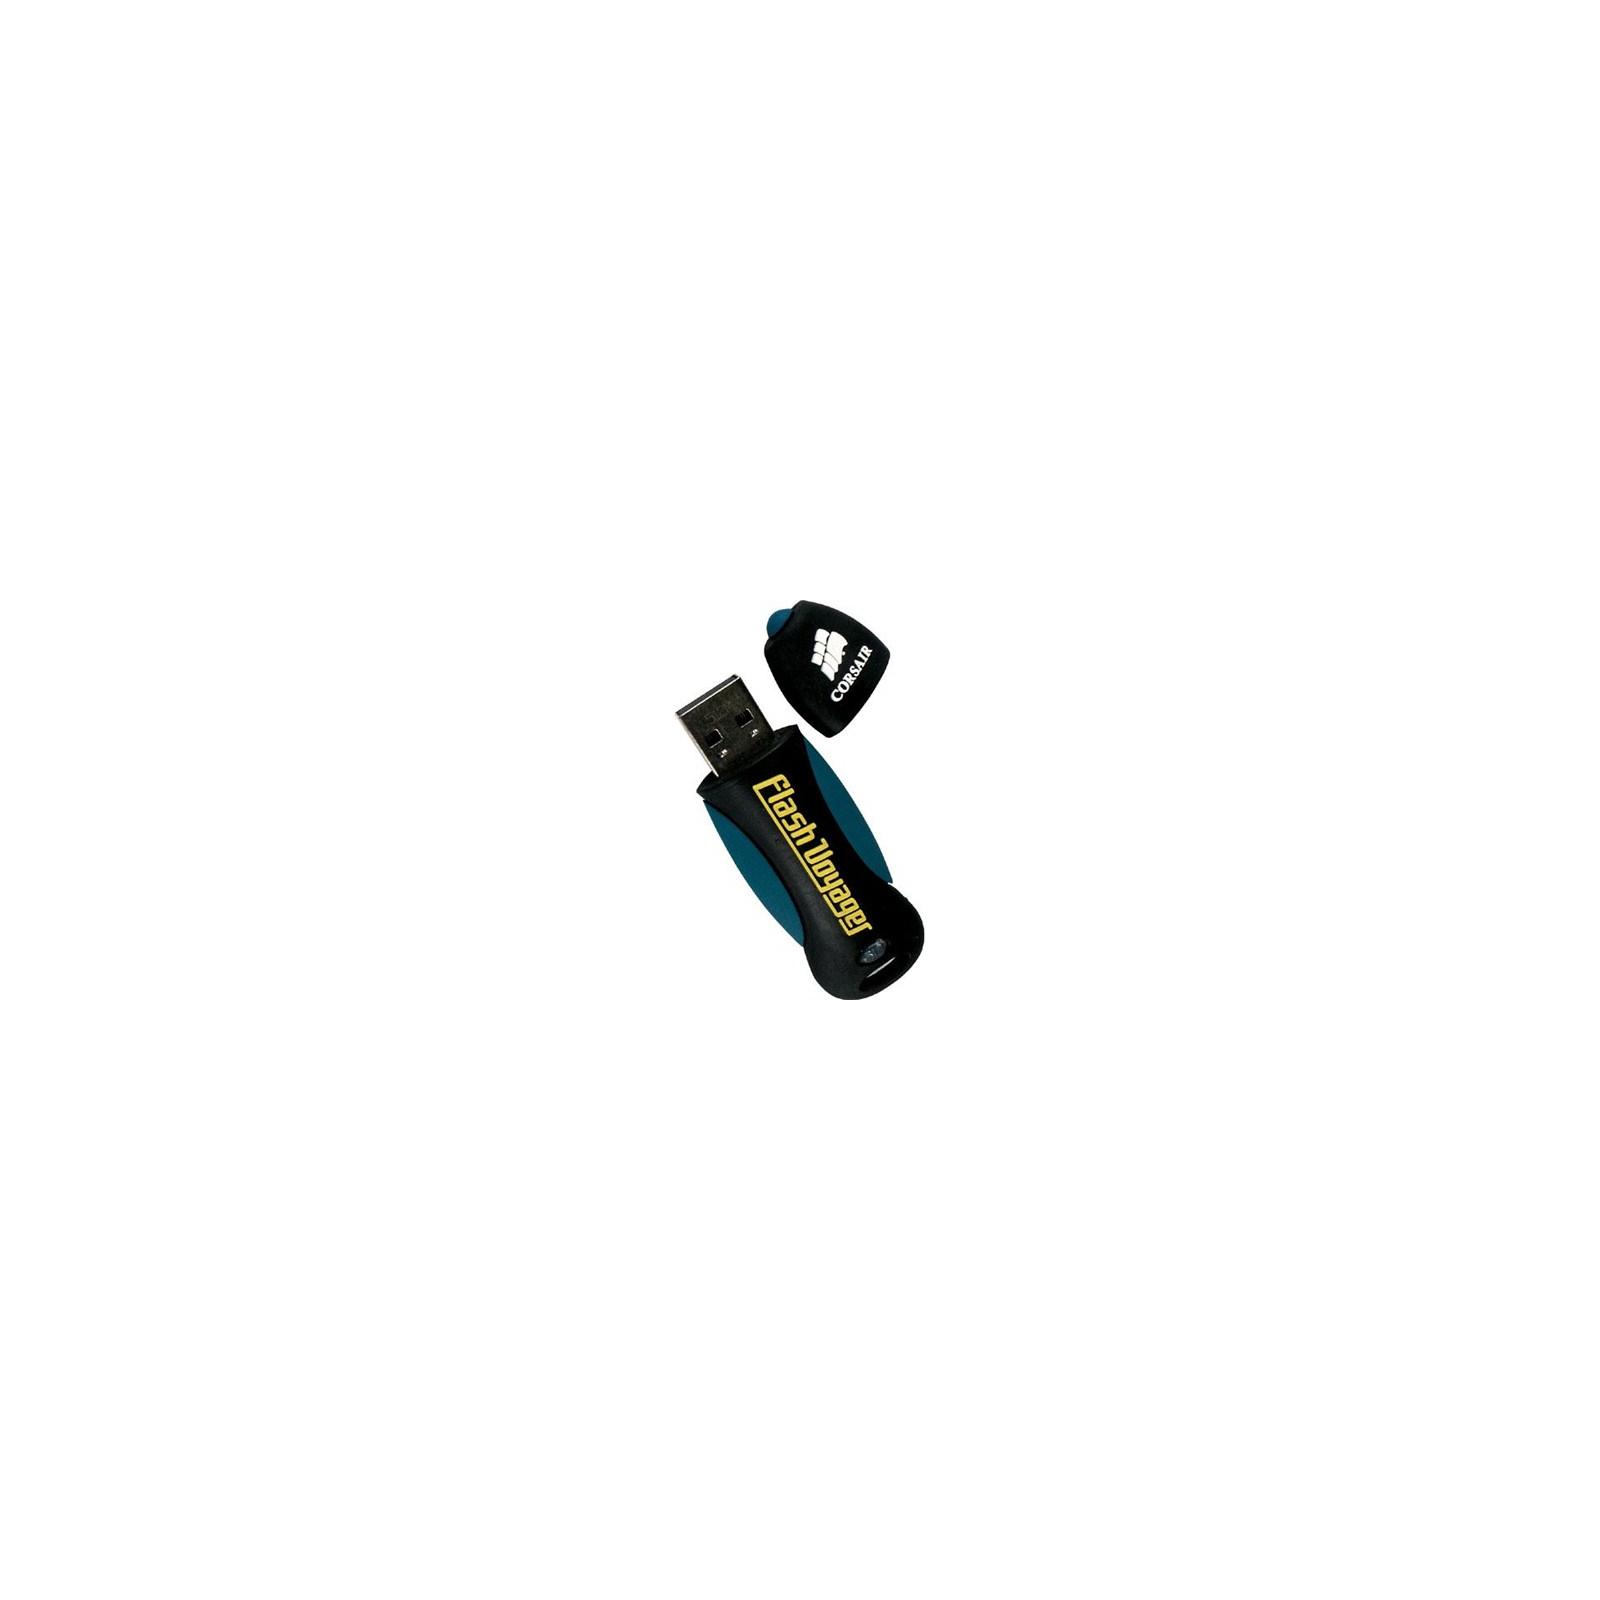 USB флеш накопитель 8Gb Flash Voyager CORSAIR (CMFUSB2.0-8GB)